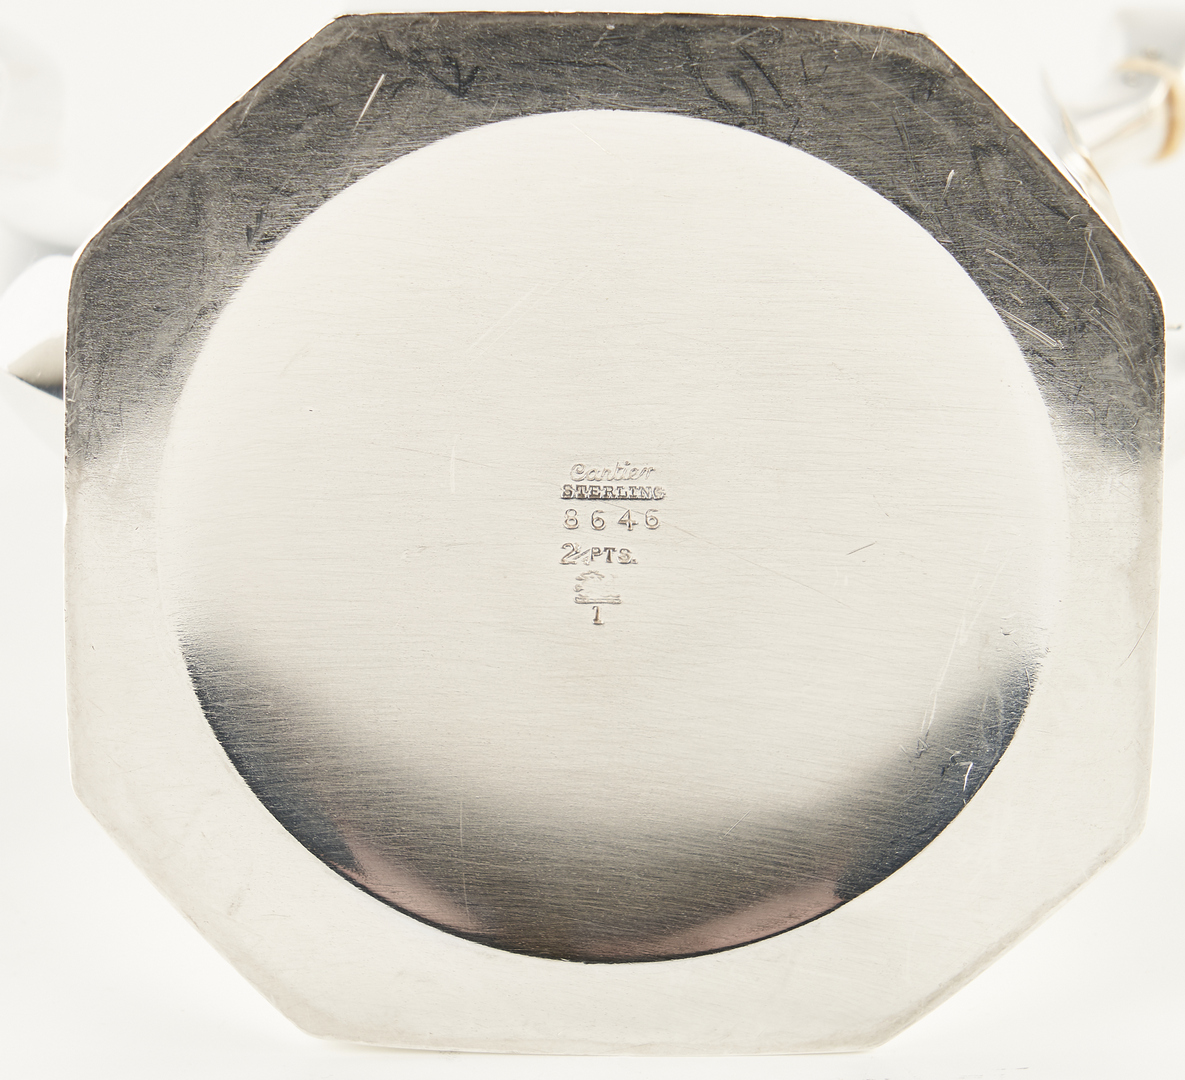 Lot 493: 3 Pcs. Cartier Sterling Silver Hollowware